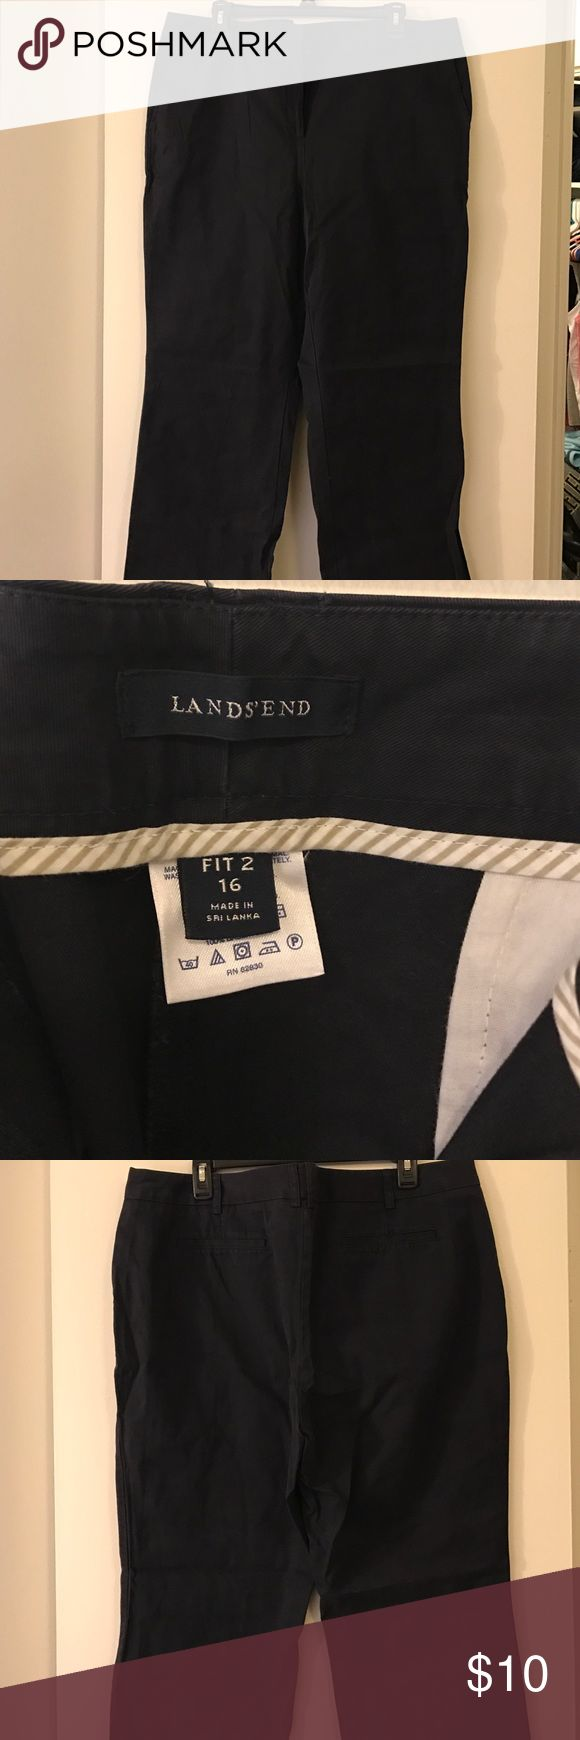 Navy dress pants Navy dress pants- never worn Lands' End Pants Boot Cut & Flare